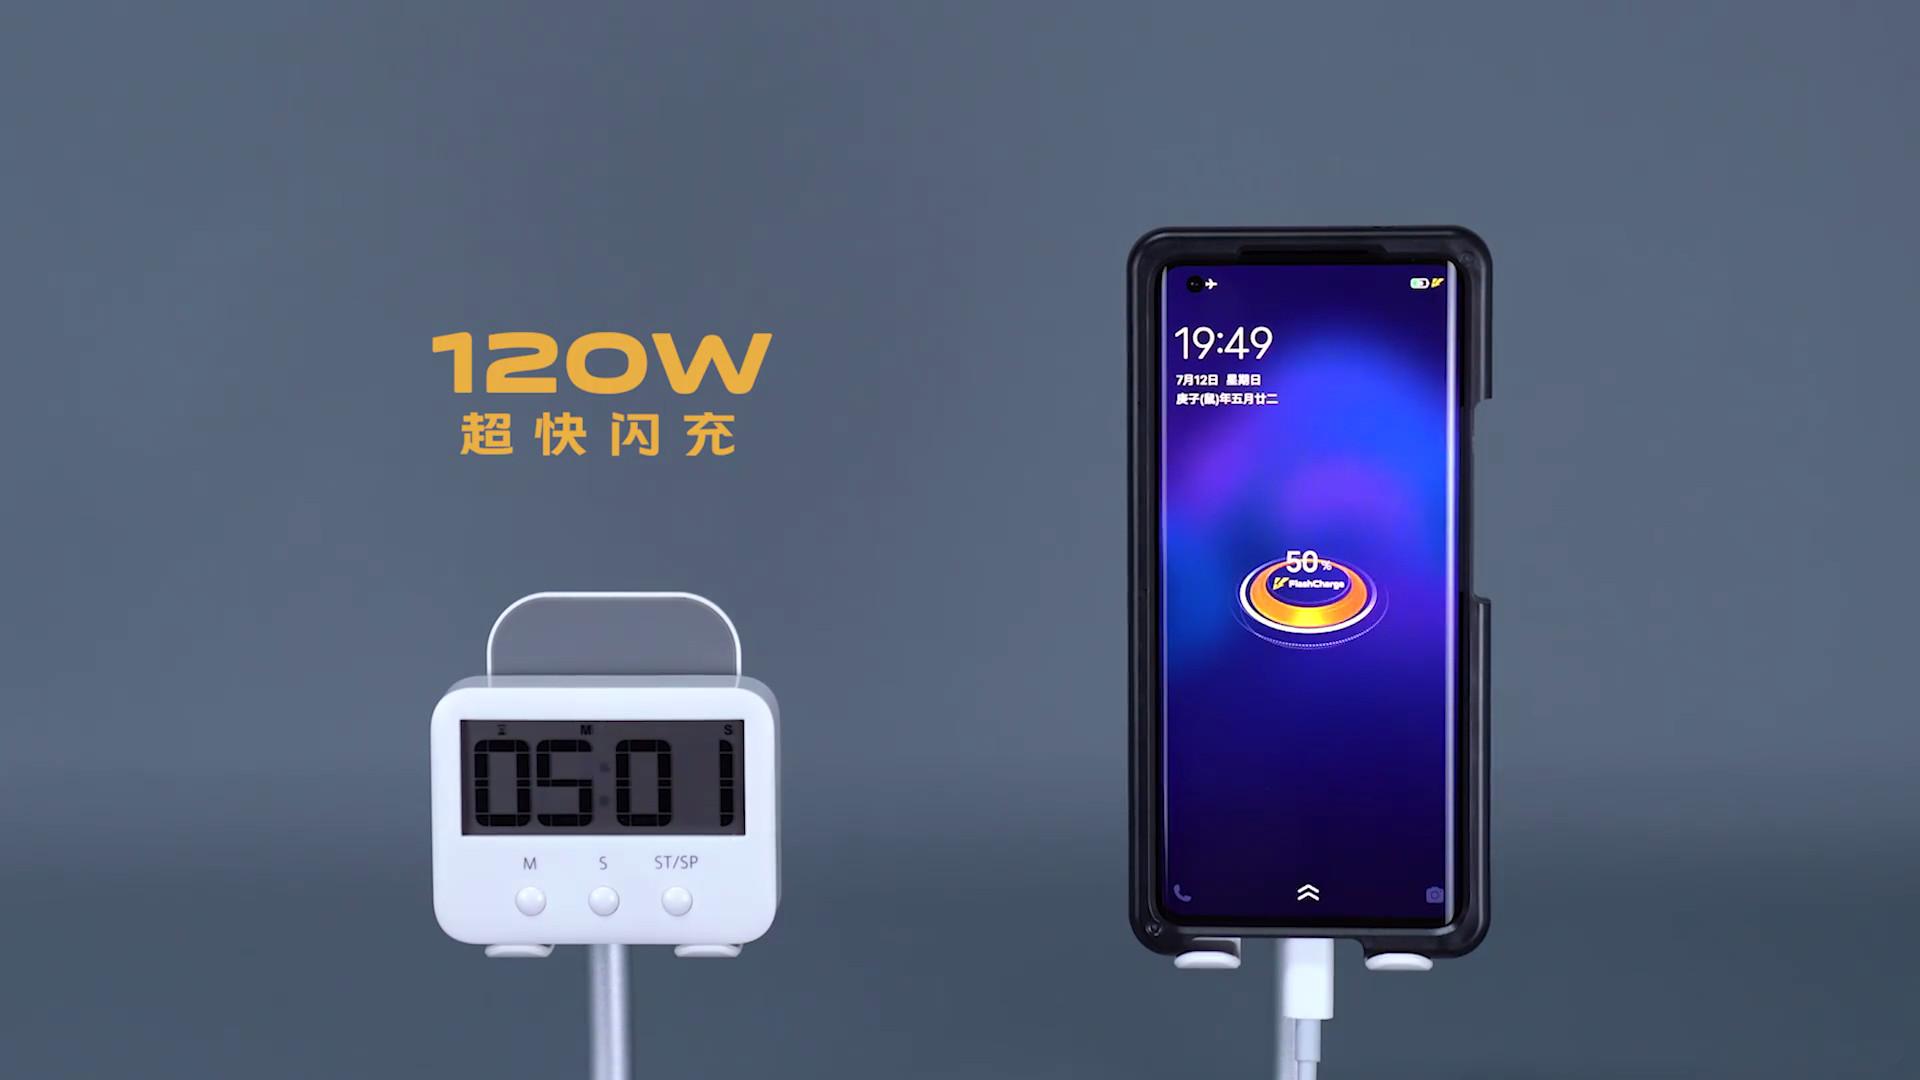 Vivo Iqoo 120W charging tech